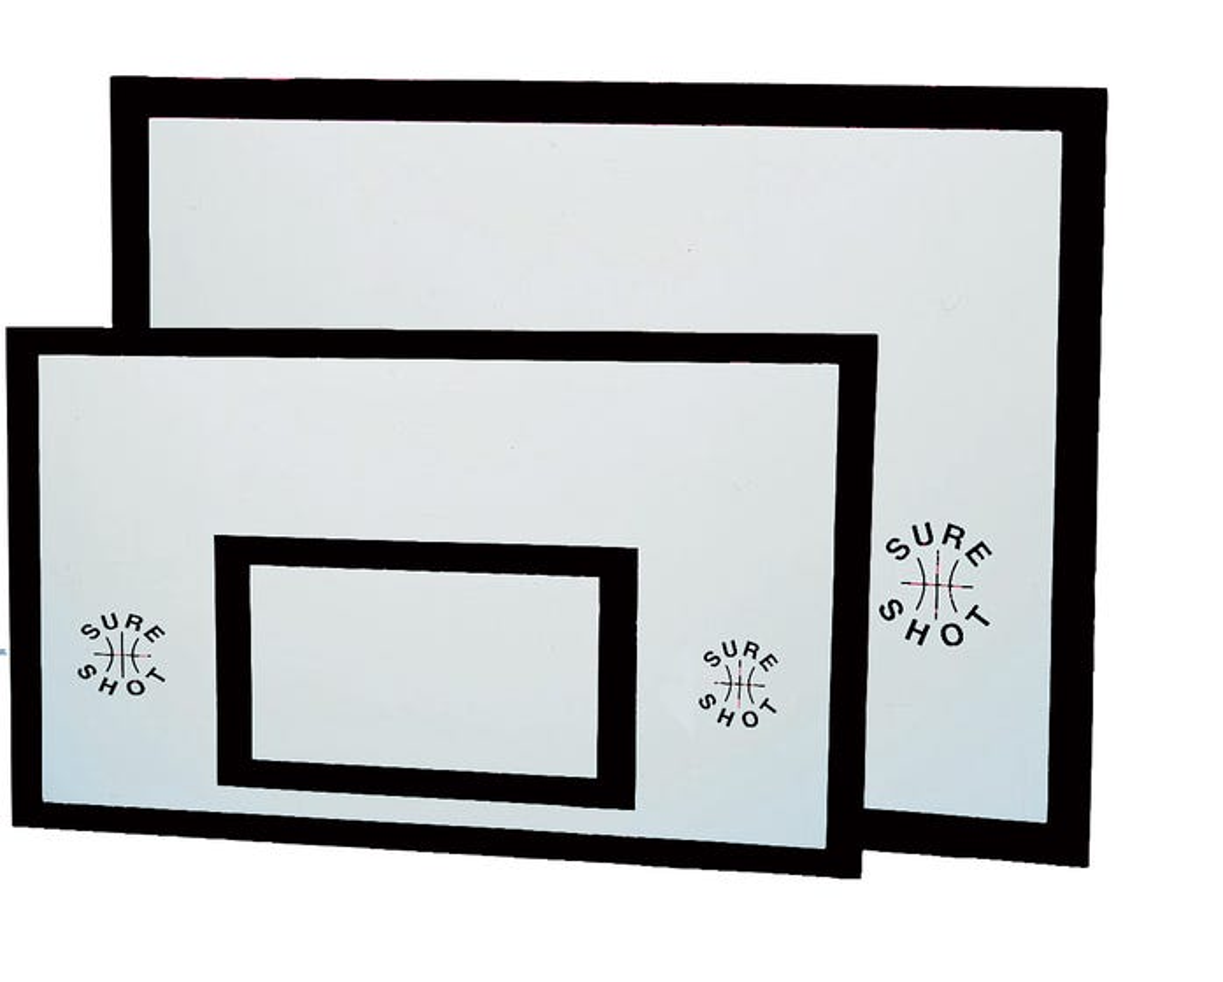 Indoor/Outdoor Wooden Basketball Backboards - Matchplay (1800mm x 1050mm x20mm)